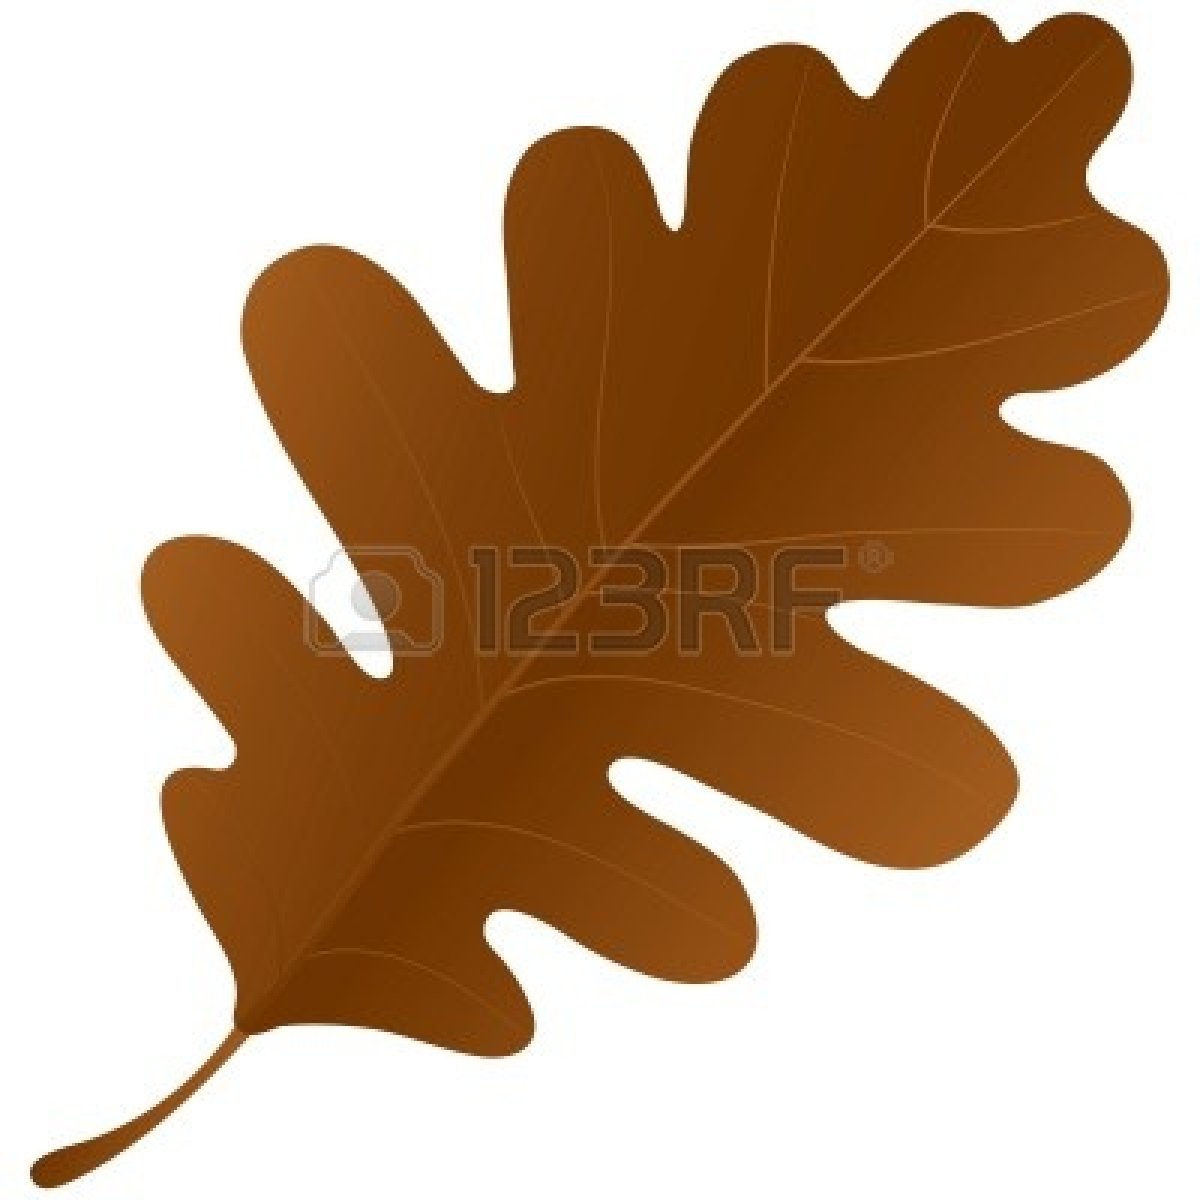 oak tree clip art silhouette at getdrawings com free for personal rh getdrawings com  oak leaf border clip art free